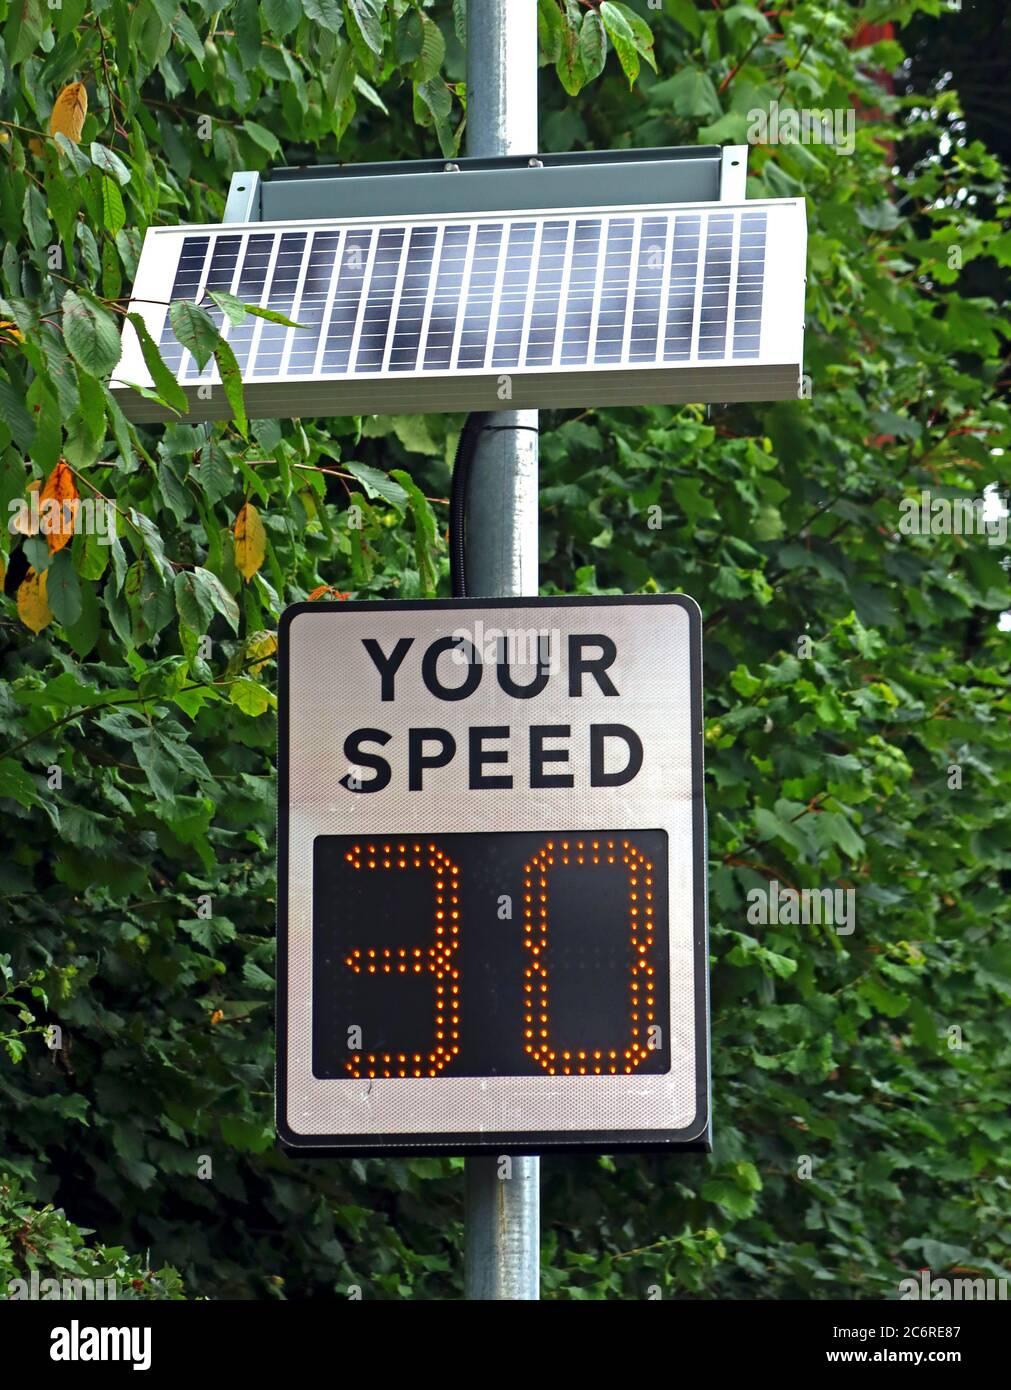 GoTonySmith,HotpixUK,@HotpixUK,England,Cheshire,UK,Warrington,Grappenhall,Thelwall,motorist,driver,community,group,problem of speeding traffic,problem,traffic,30 zone,30mph,zone,30 mph,solar powered,radar,speed radar,WA4,keeping to 30mph,limit,30 means 30,30means30